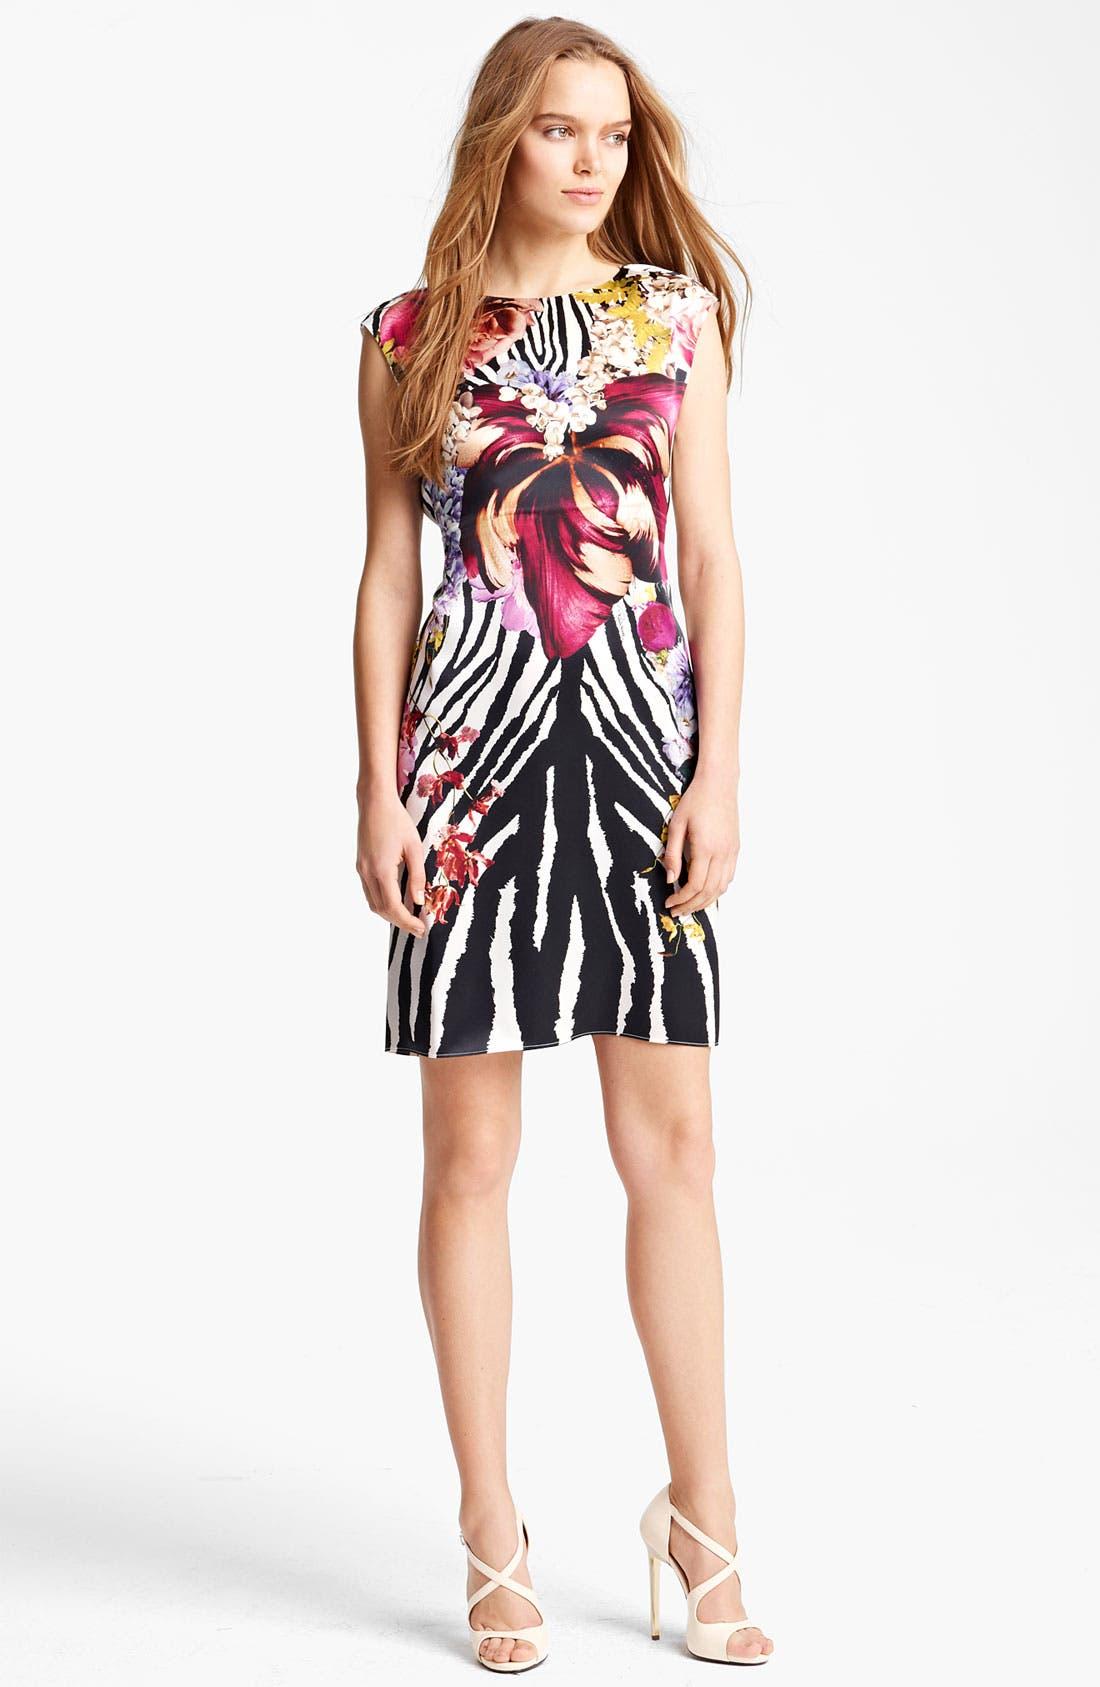 Main Image - Roberto Cavalli Floral & Animal Print Dress